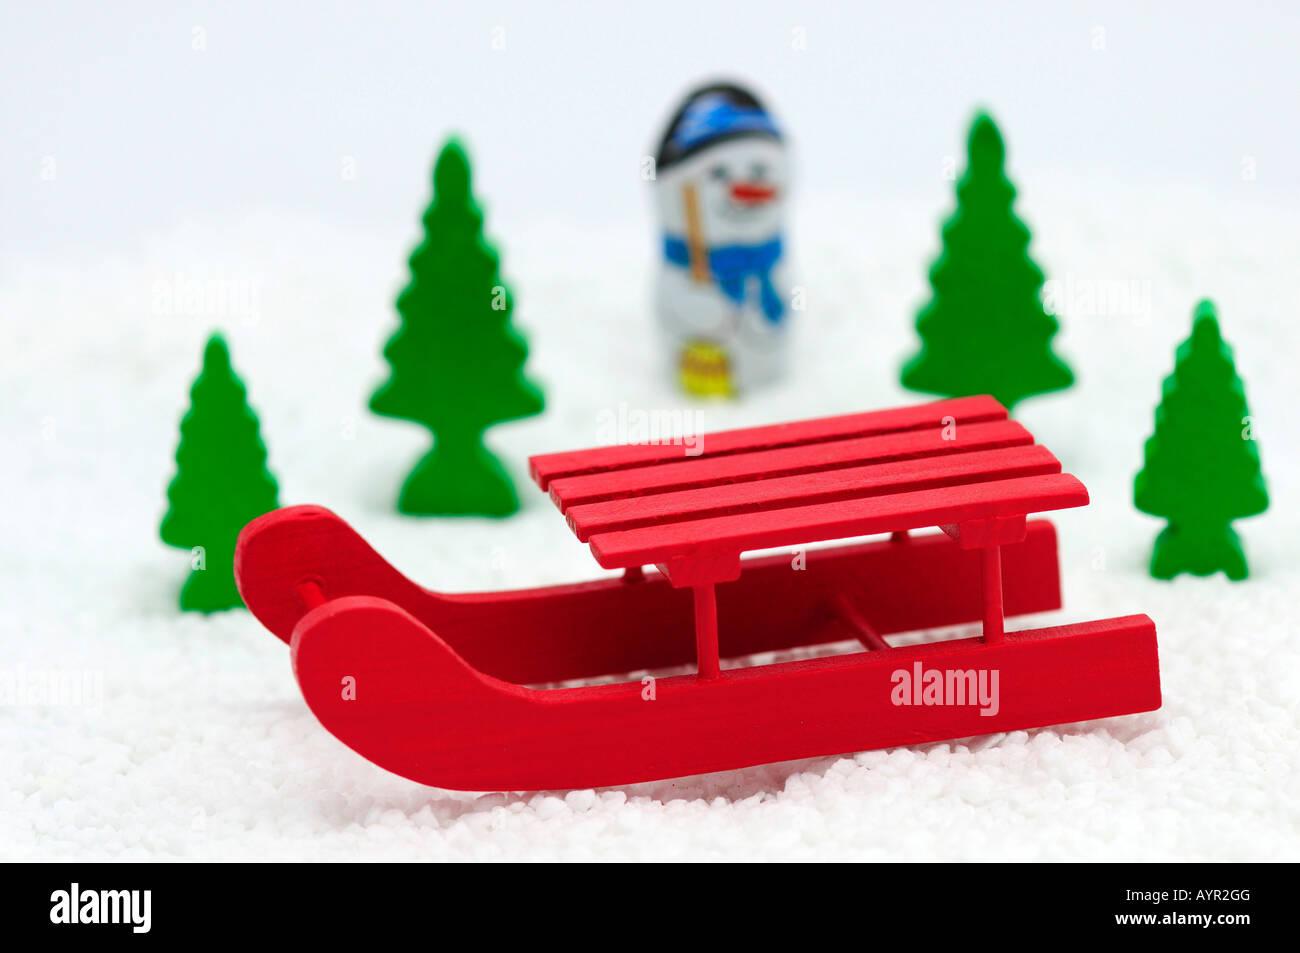 Snowman behind a sleigh, winter landscape - Stock Image